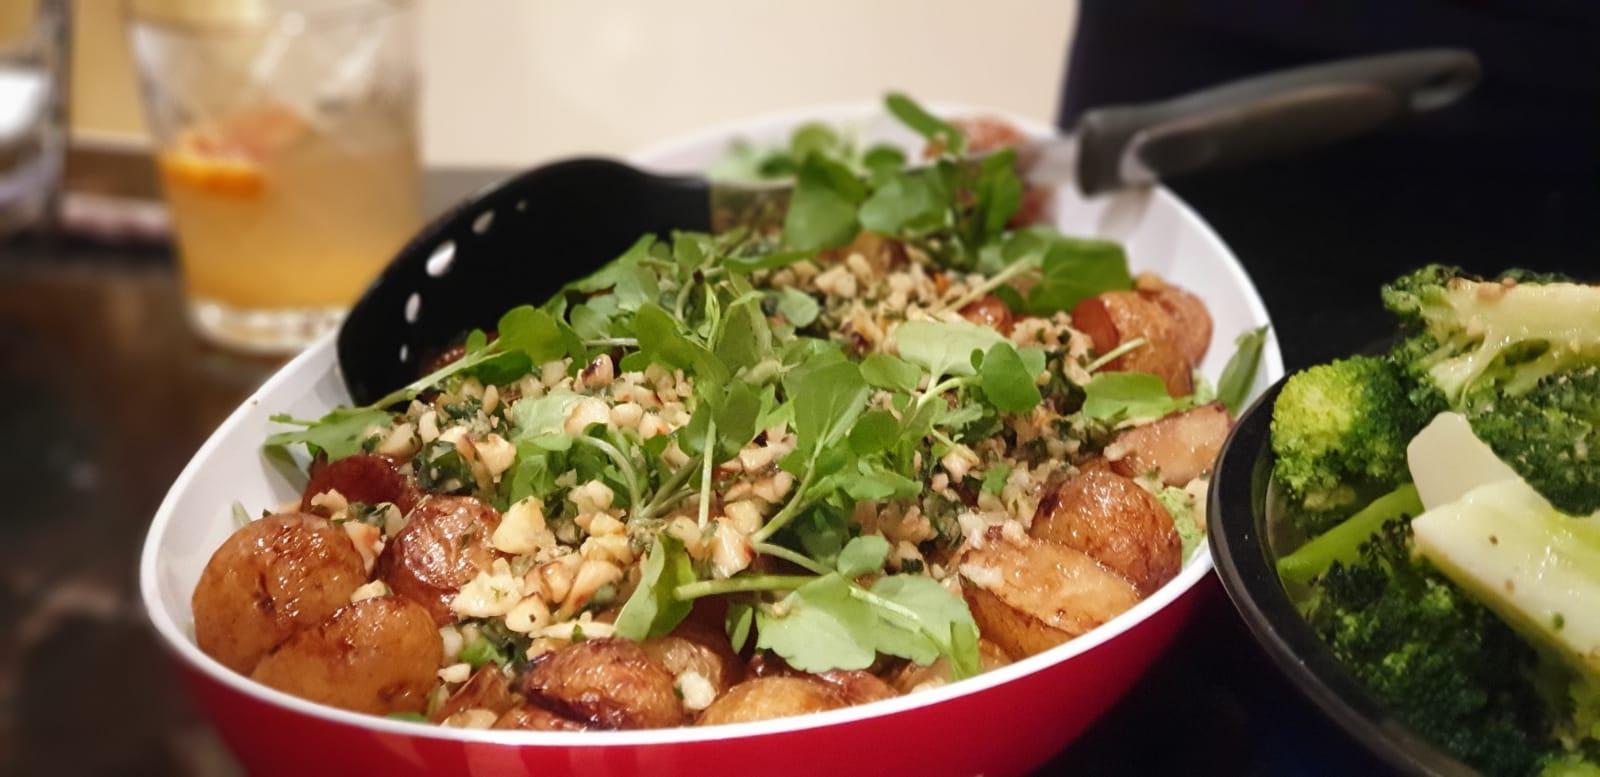 Veganuary dishes